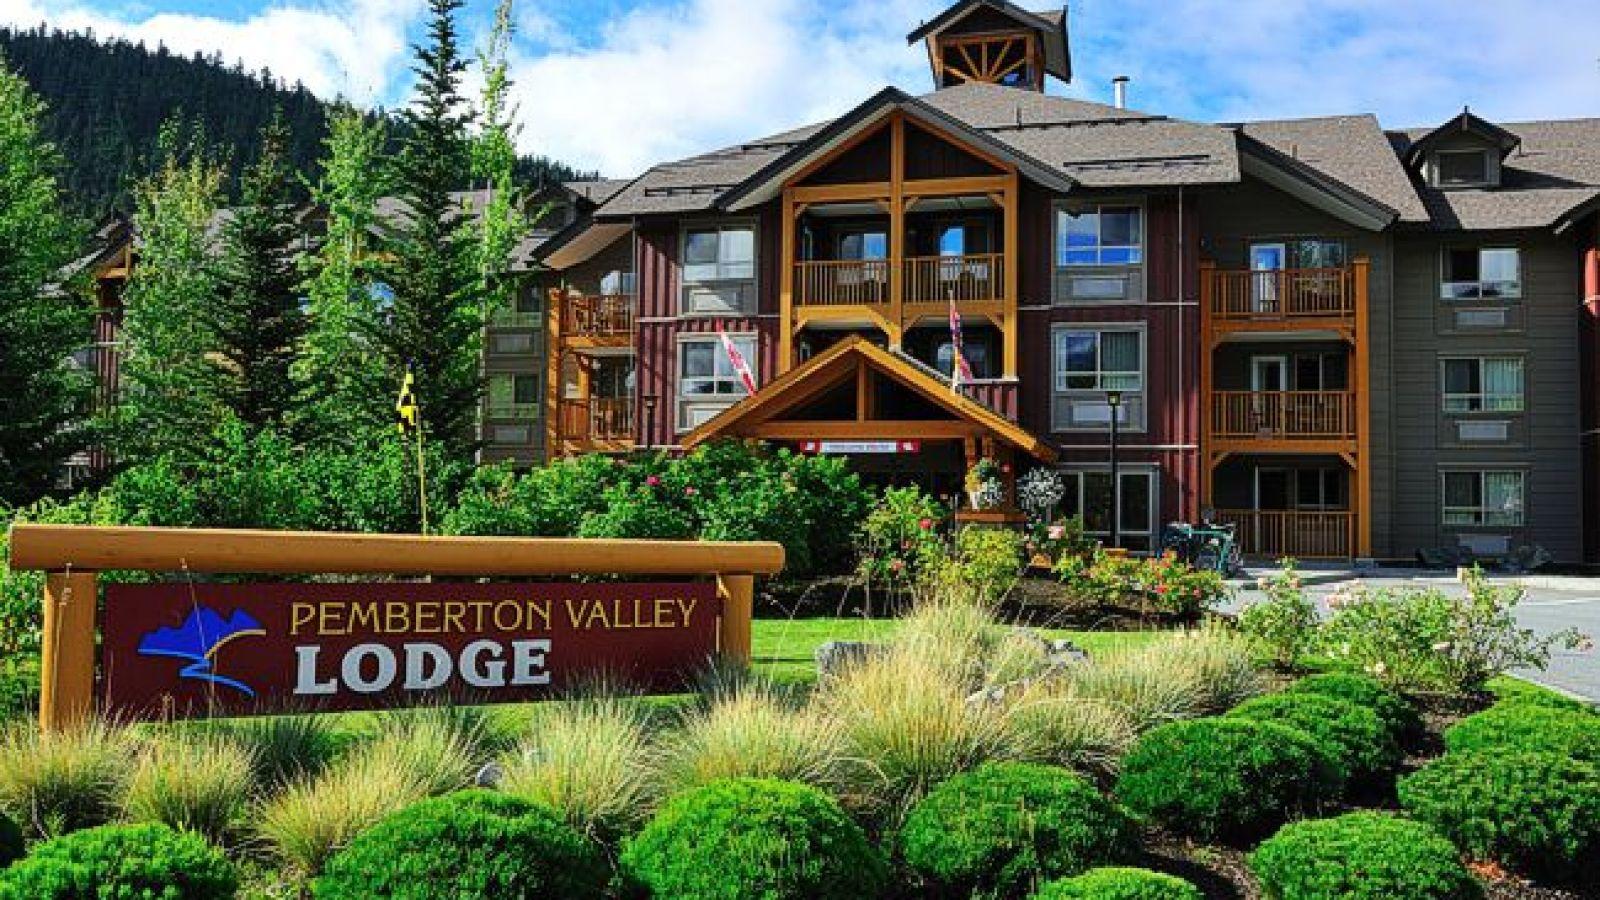 Pemberton Valley Lodge - front view